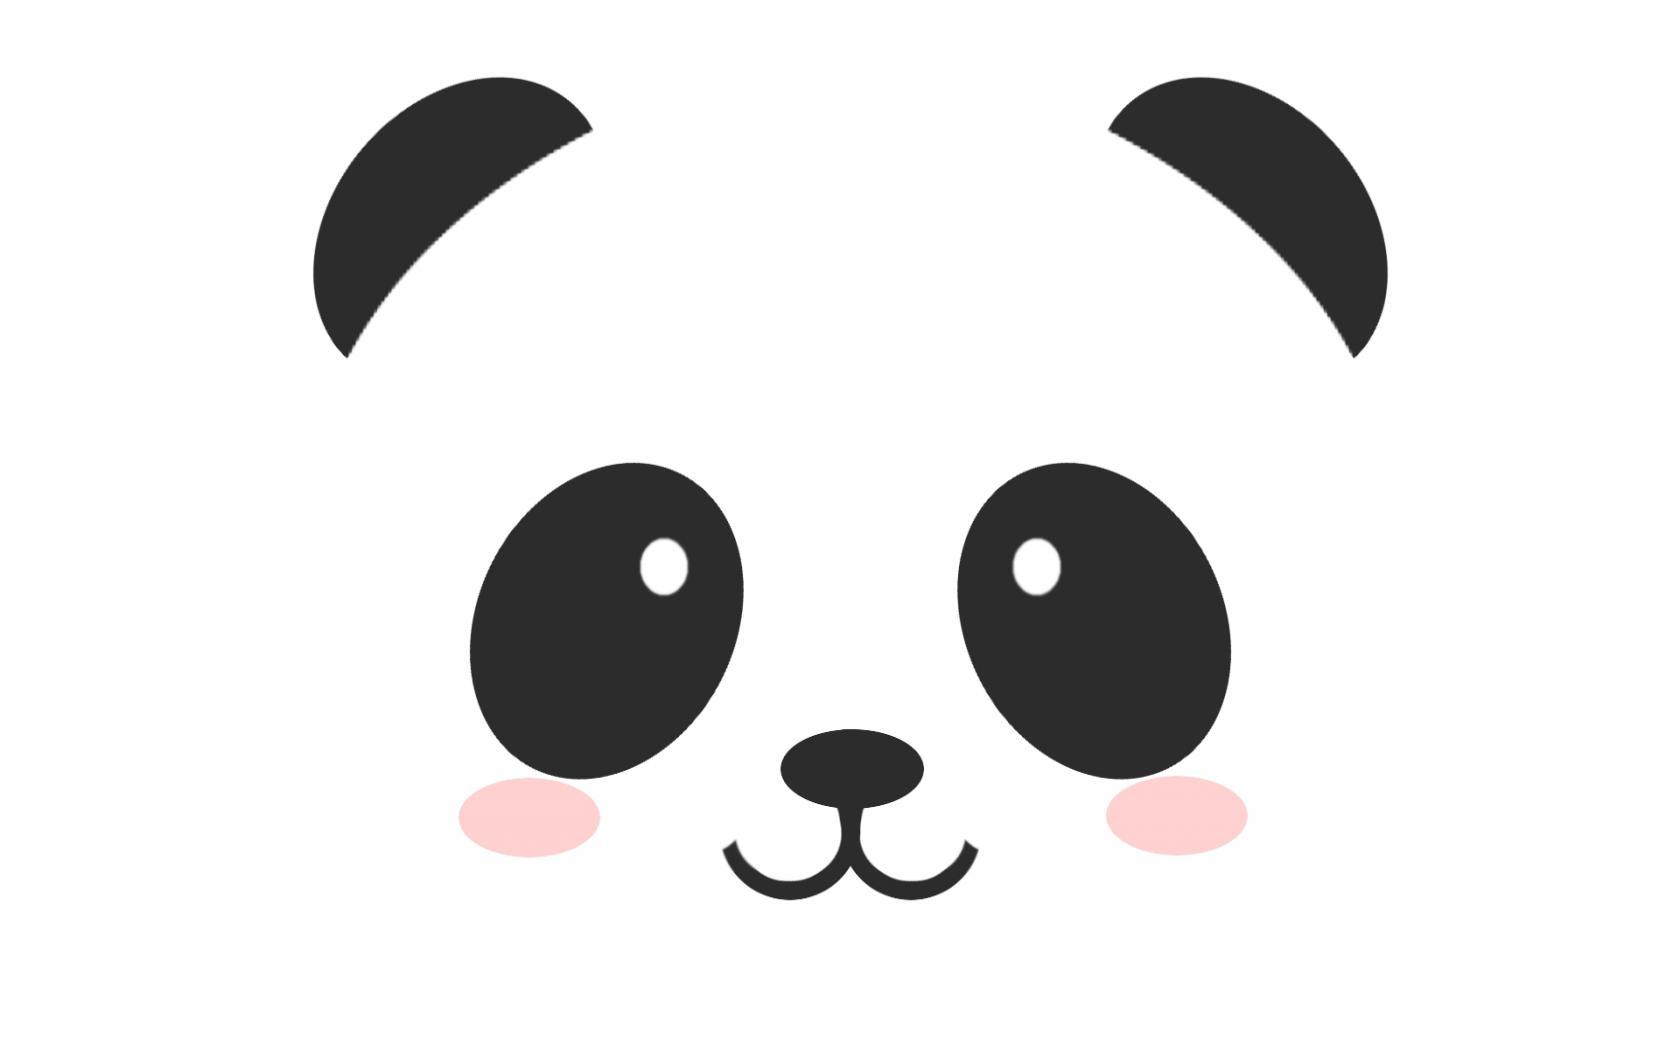 Cute Girl Background Wallpaper Cute Panda Wallpaper 15787 1680x1050 Px Hdwallsource Com